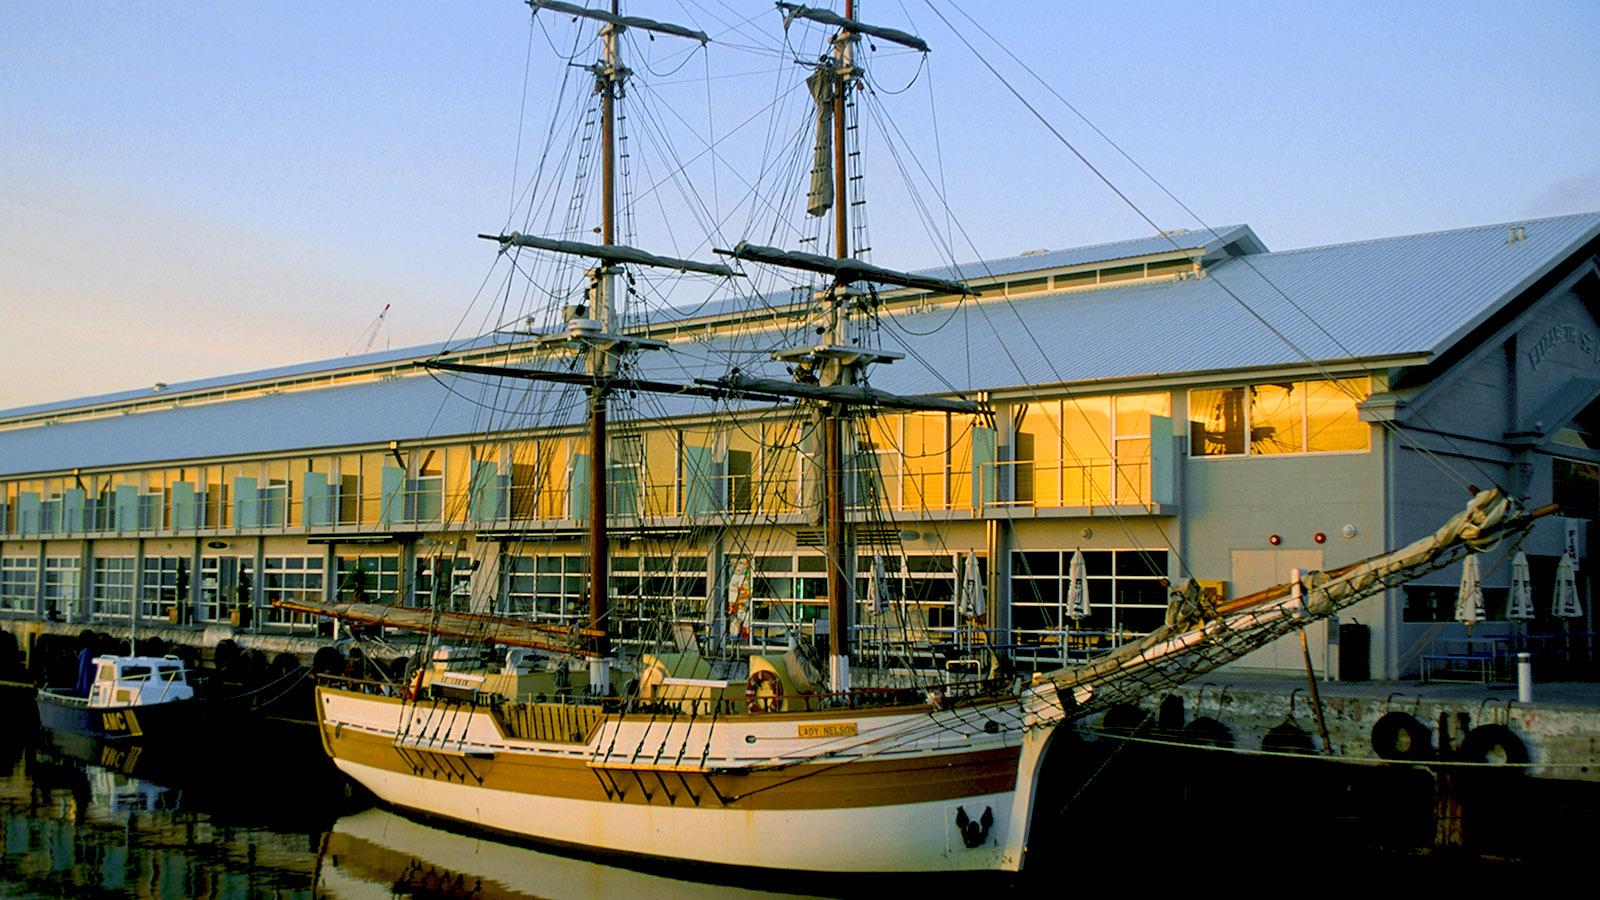 Hobart, Elizabeth Pier mit historischem Segler. Foto: Hilke Maunder